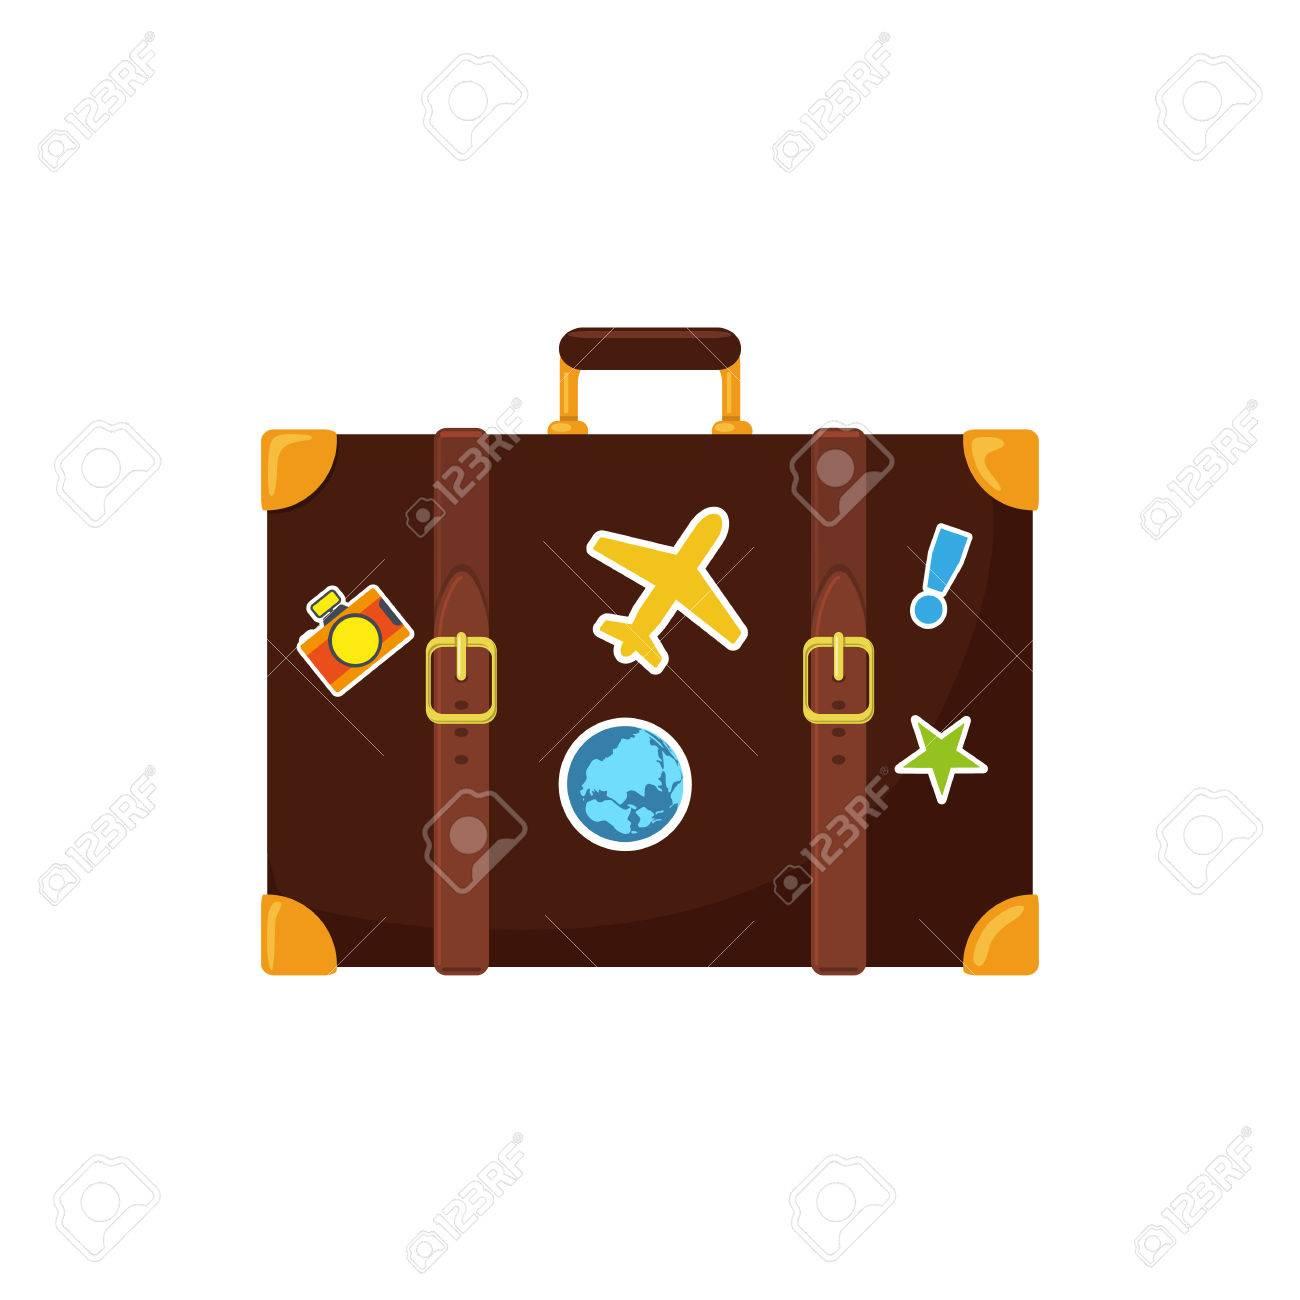 Journey suitcase. Stock Vector - 39578156